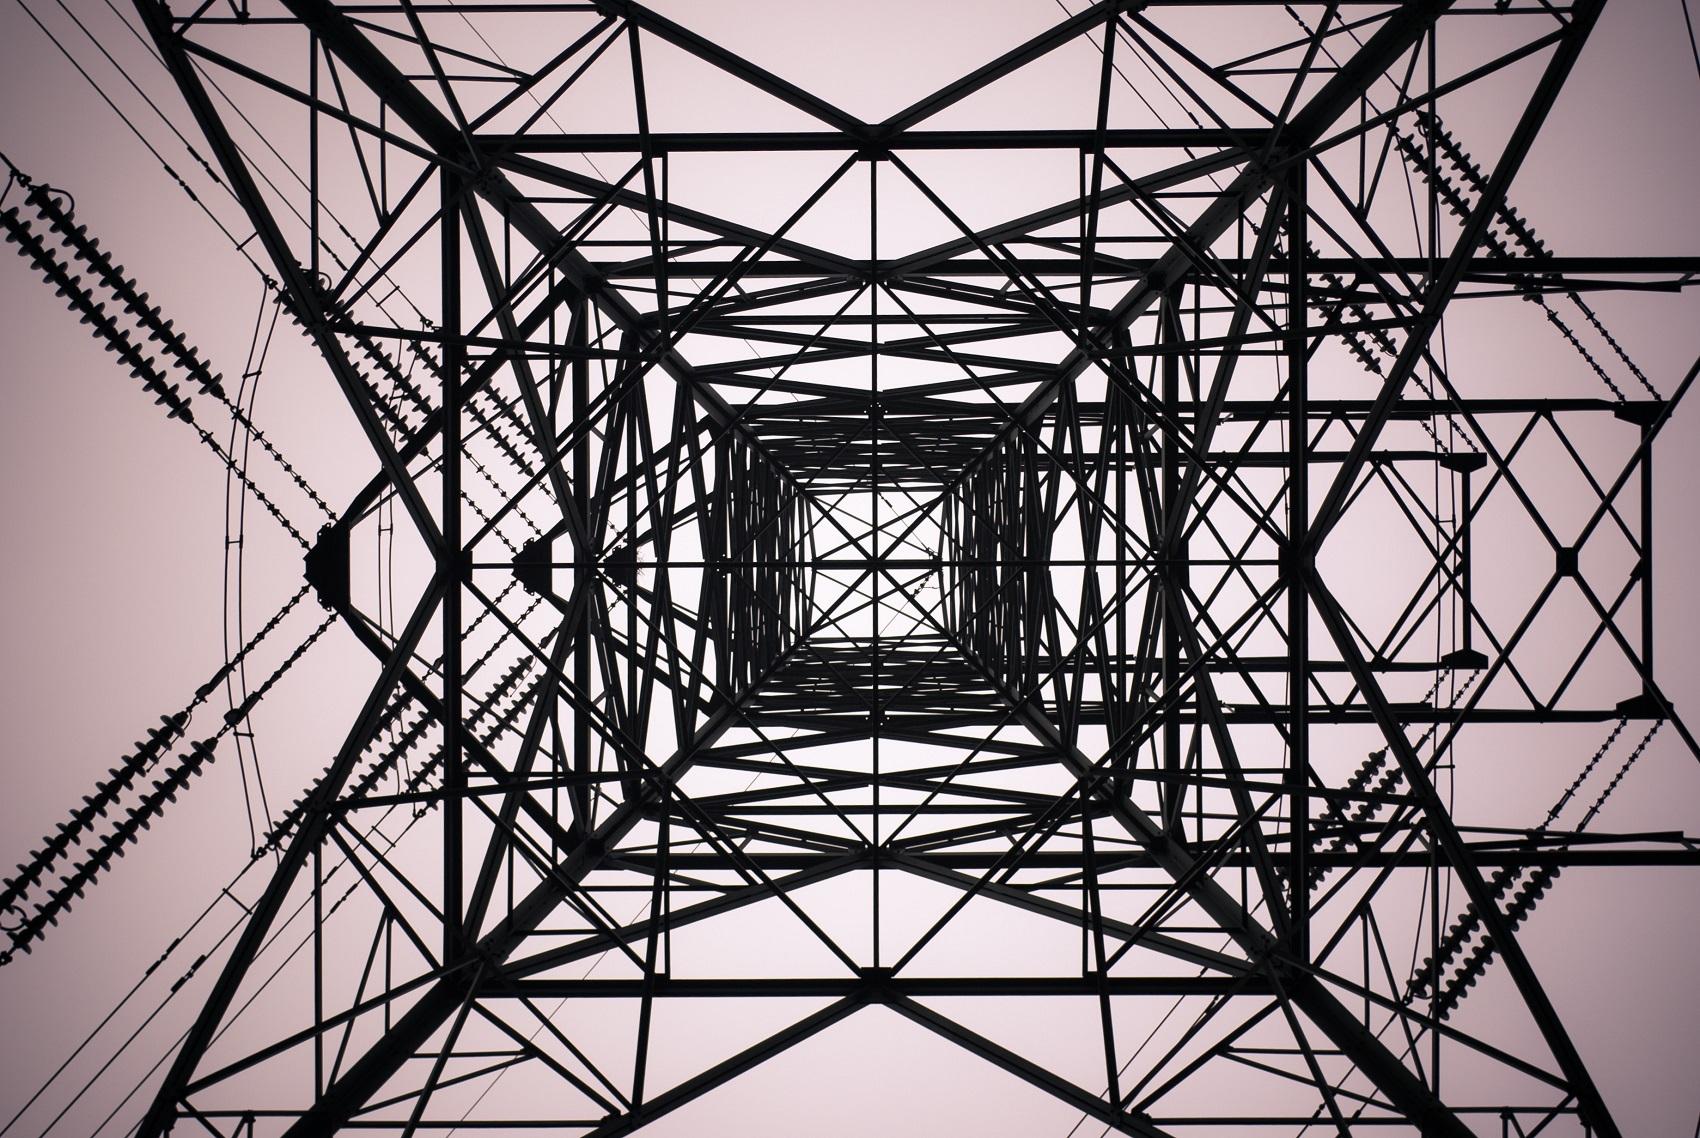 AFWERX announces Reimagining Energy Challenge